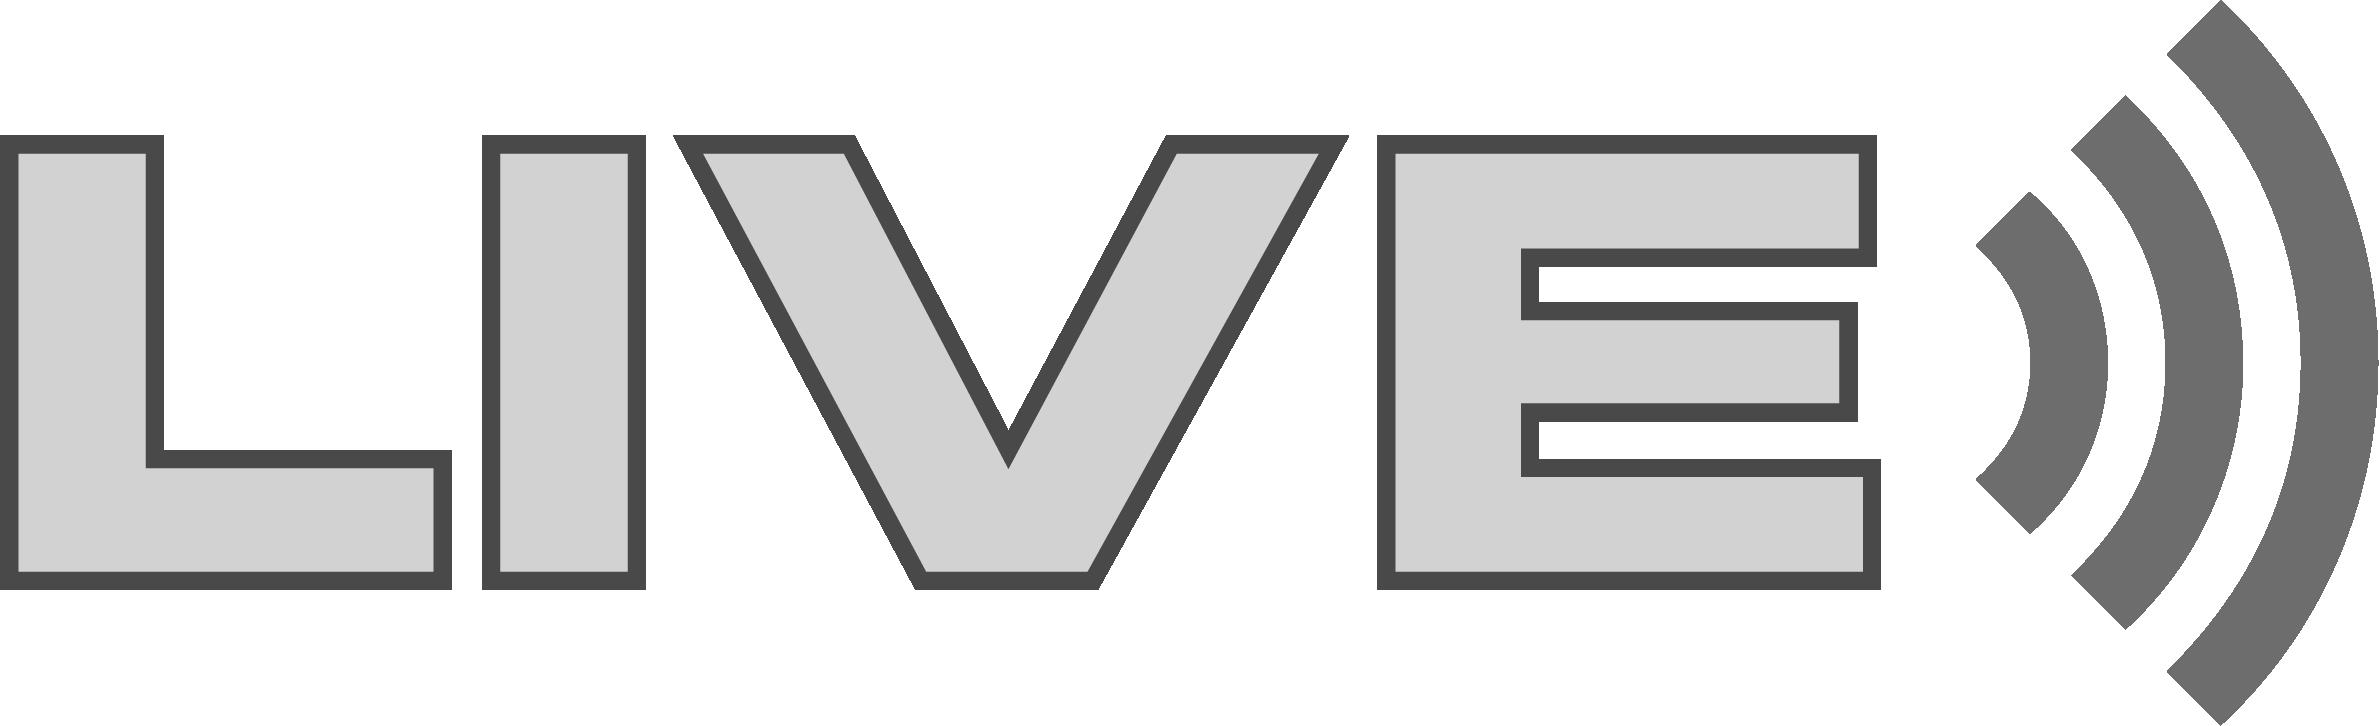 vrx live logo